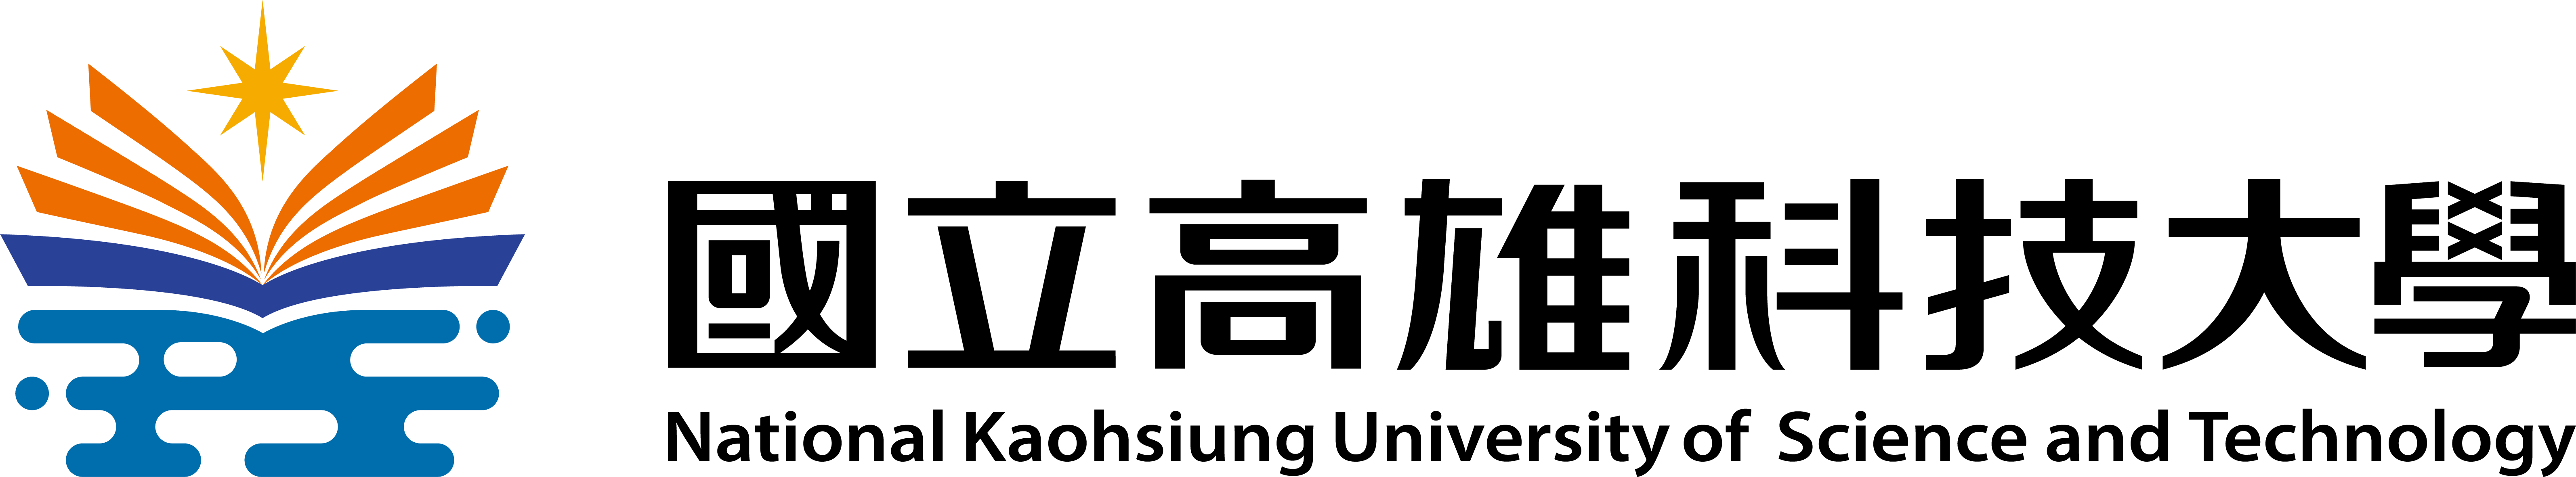 Nkust Logo